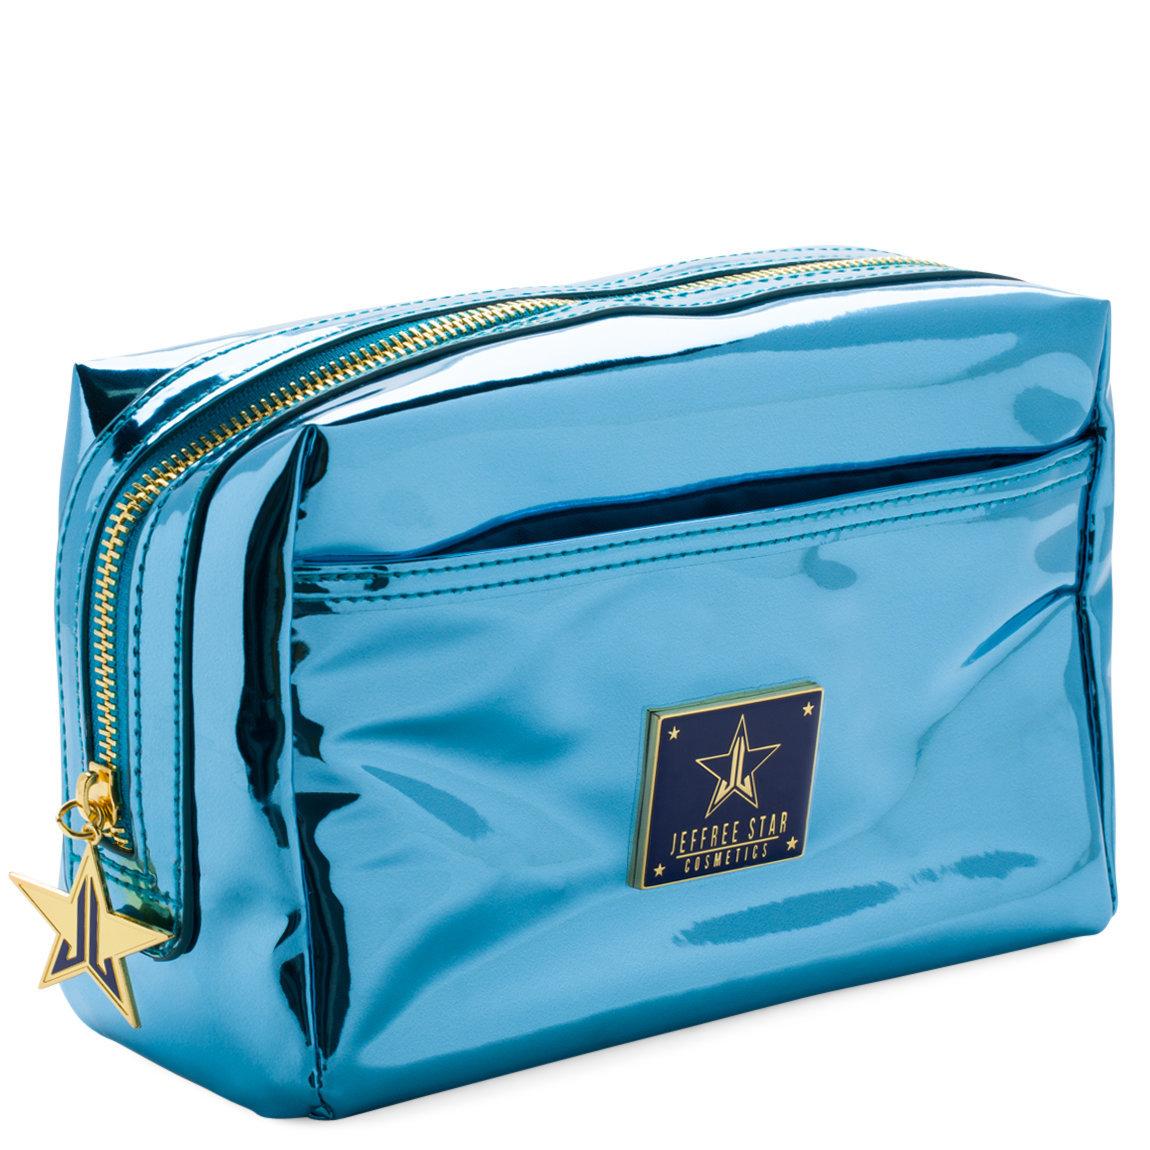 Jeffree Star Cosmetics Makeup Bag Reflective Light Blue product swatch.